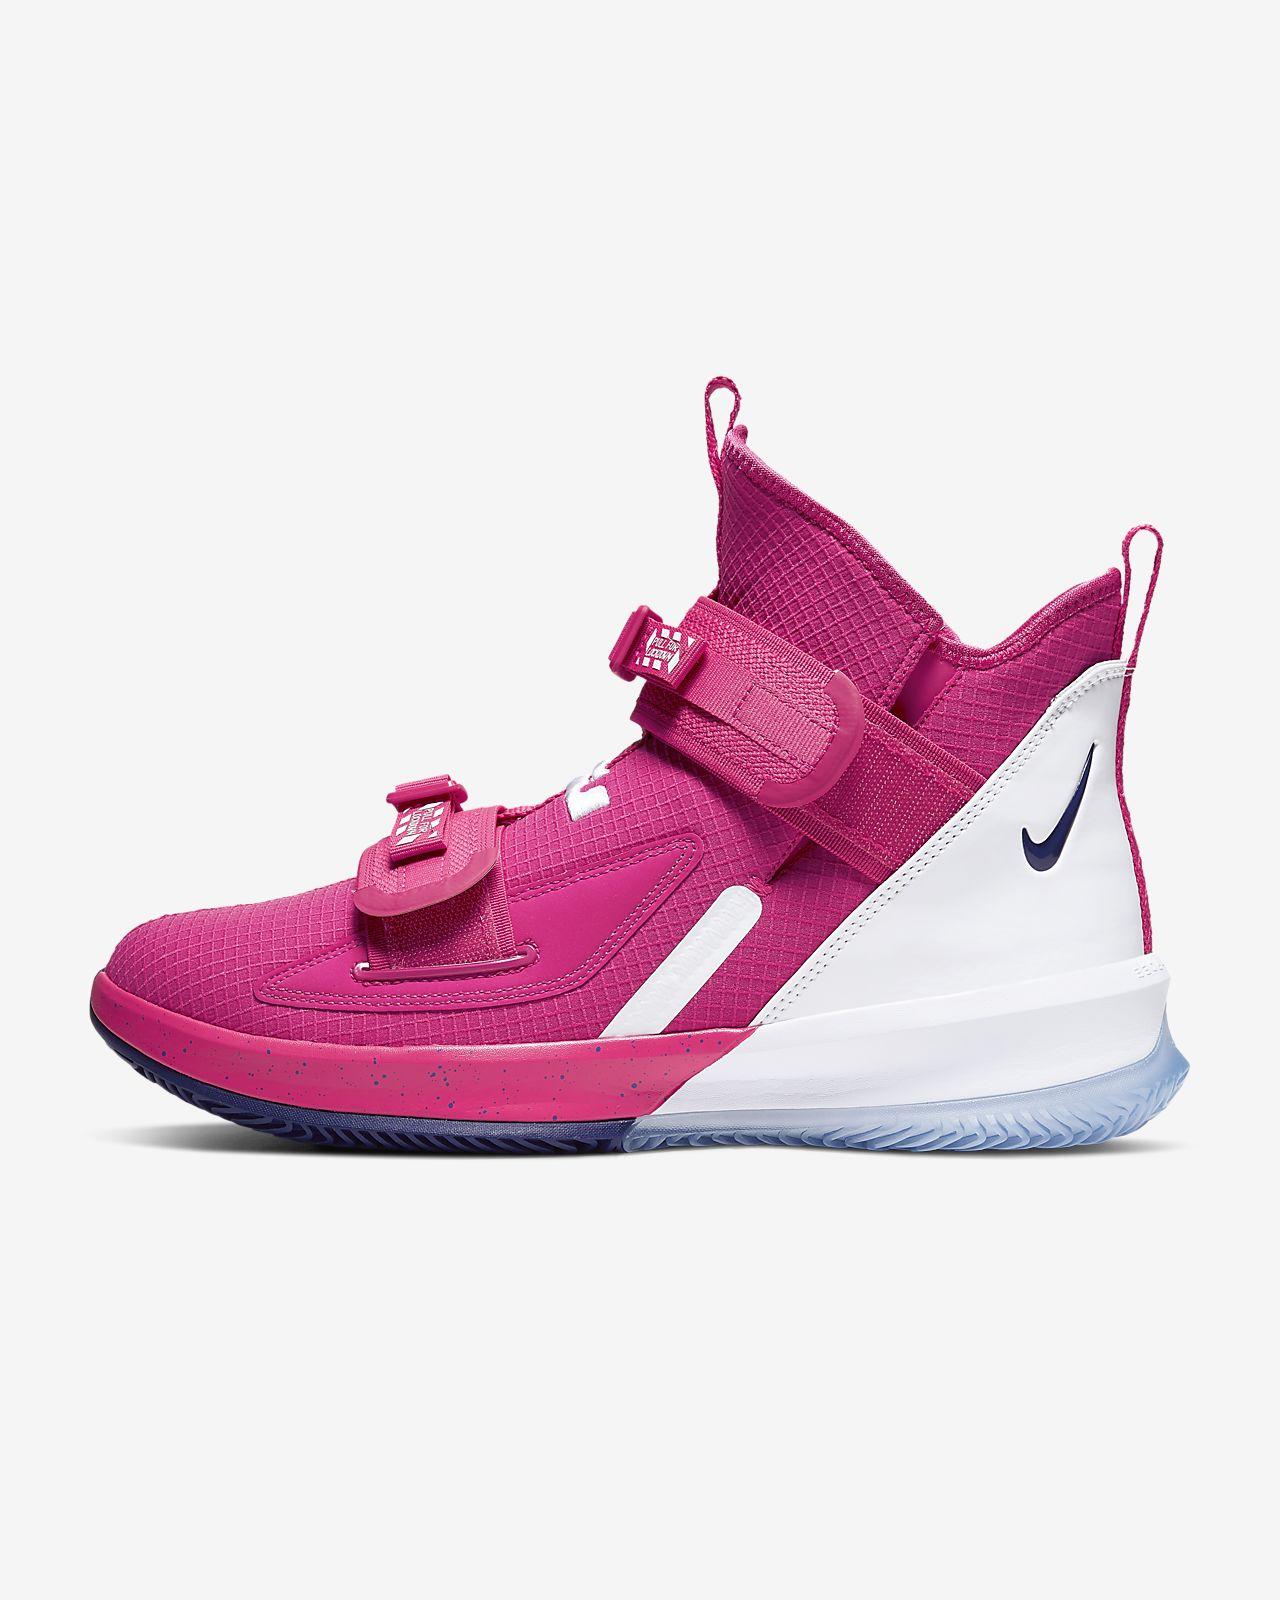 LeBron Soldier 13 Kay Yow Basketball Shoe